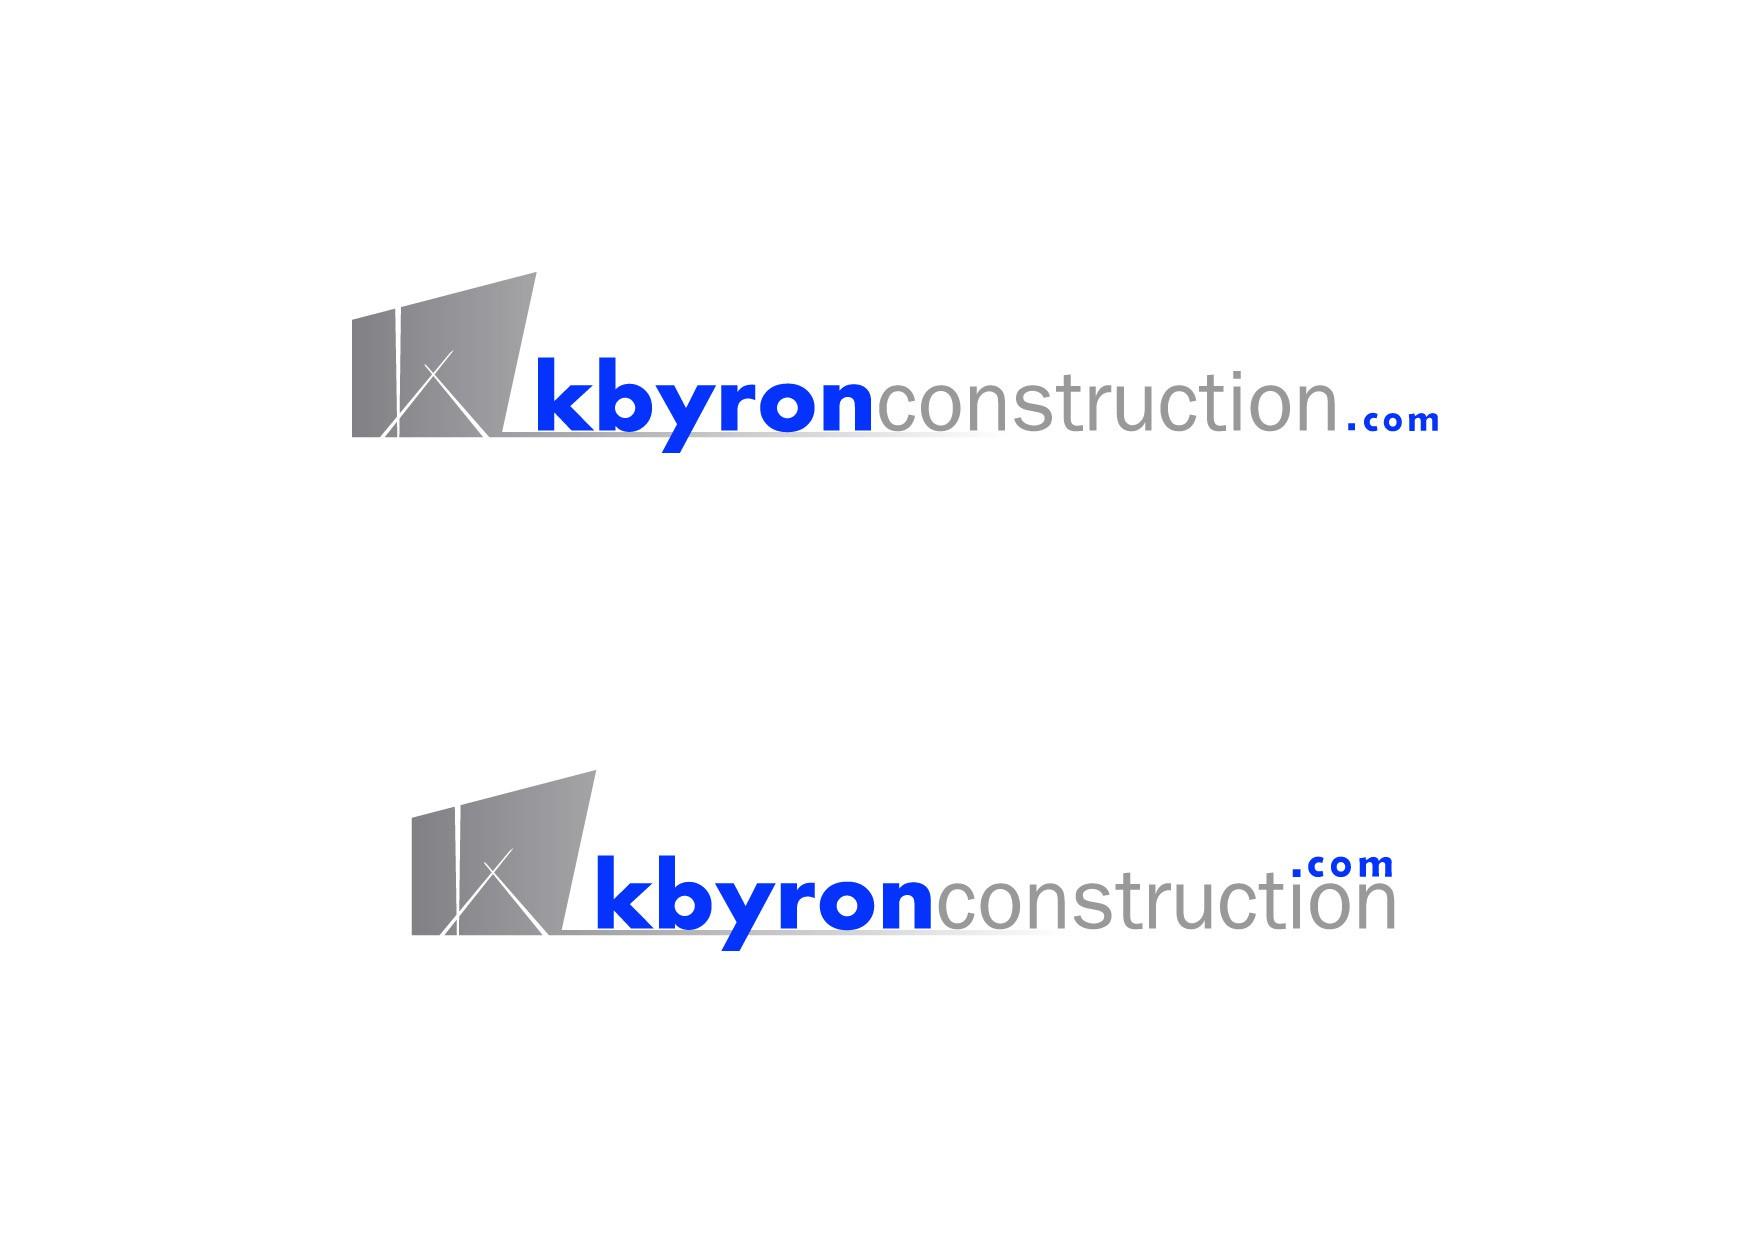 Help kbyronconstruction with a new logo